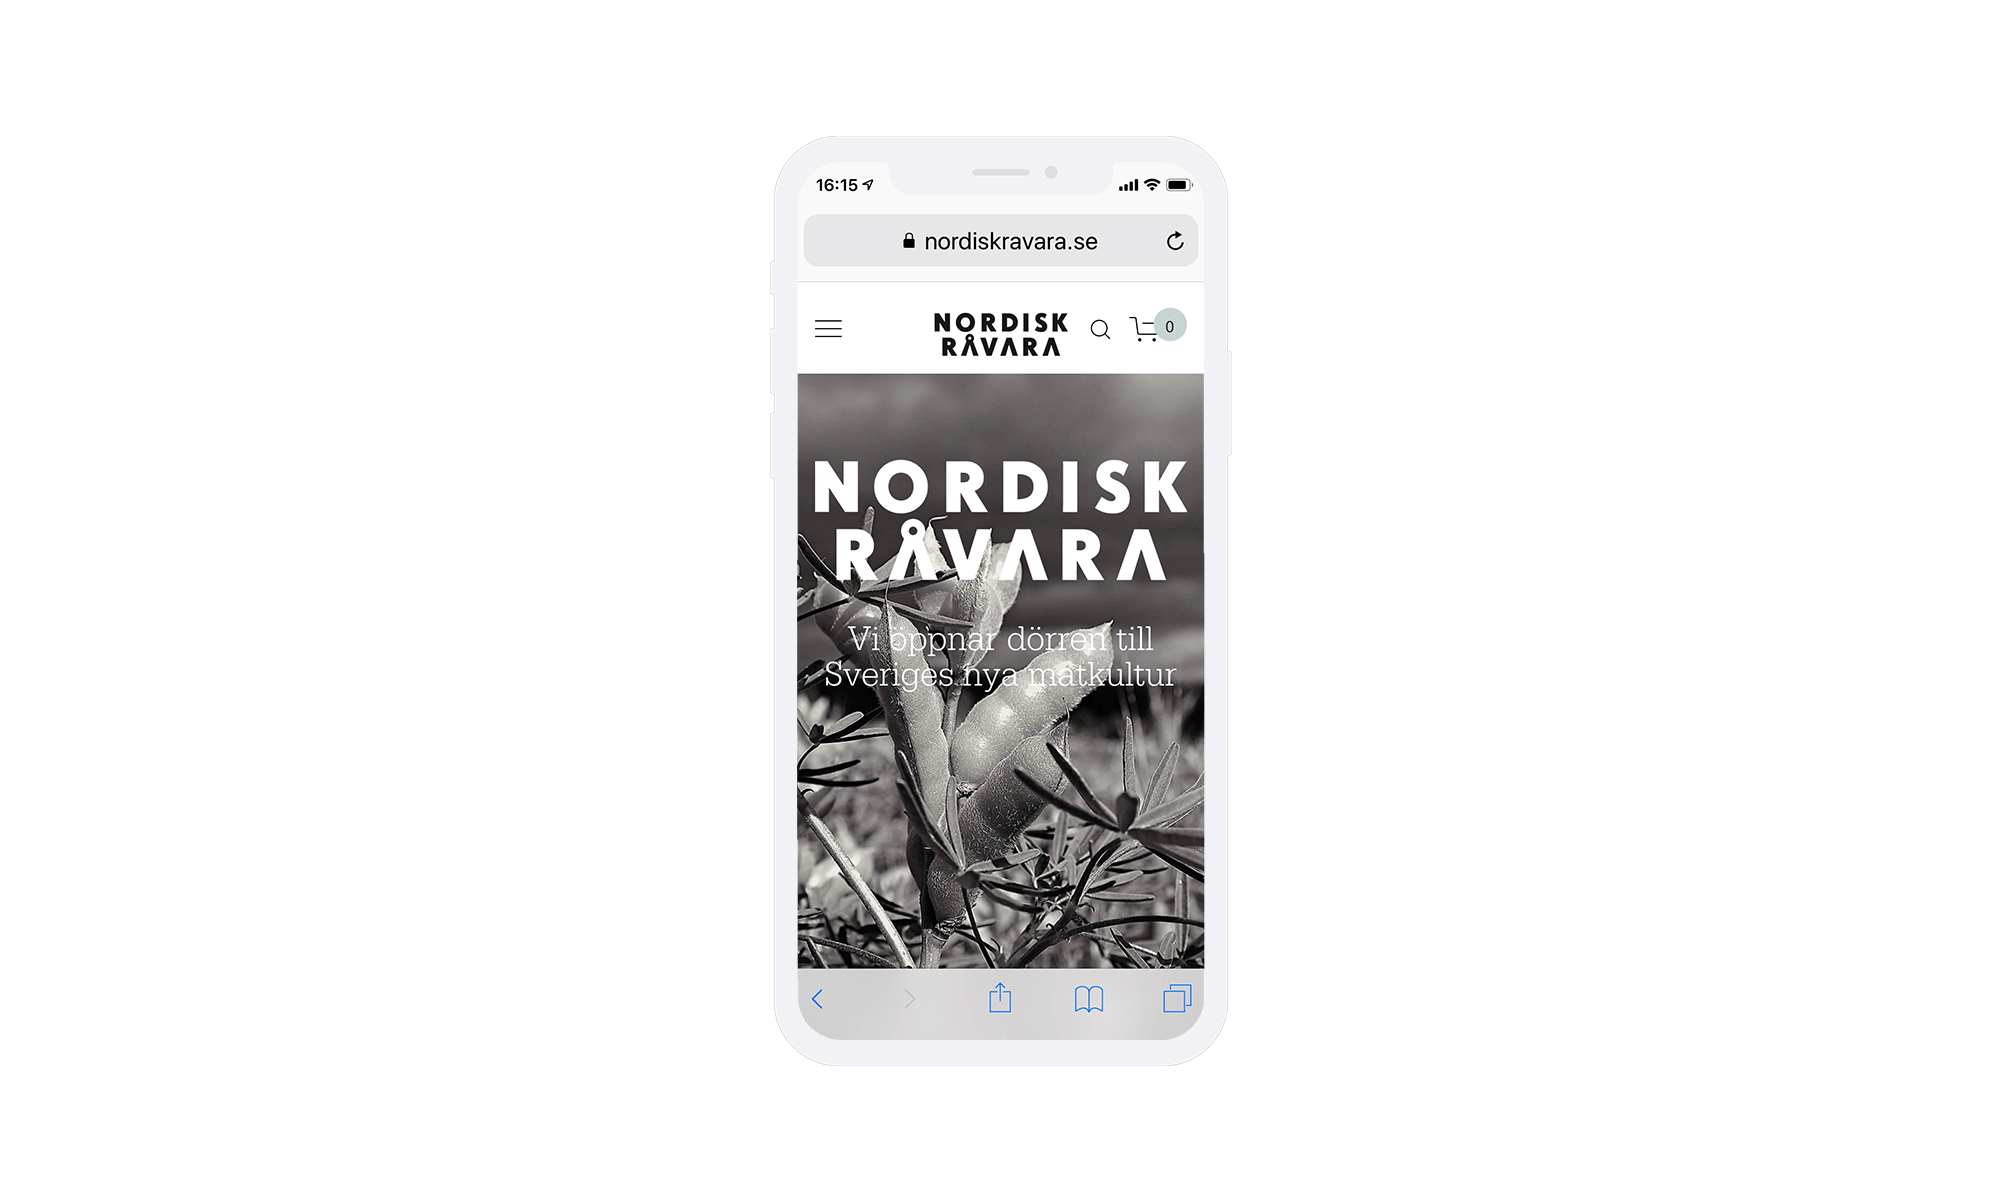 nordiskravara.se